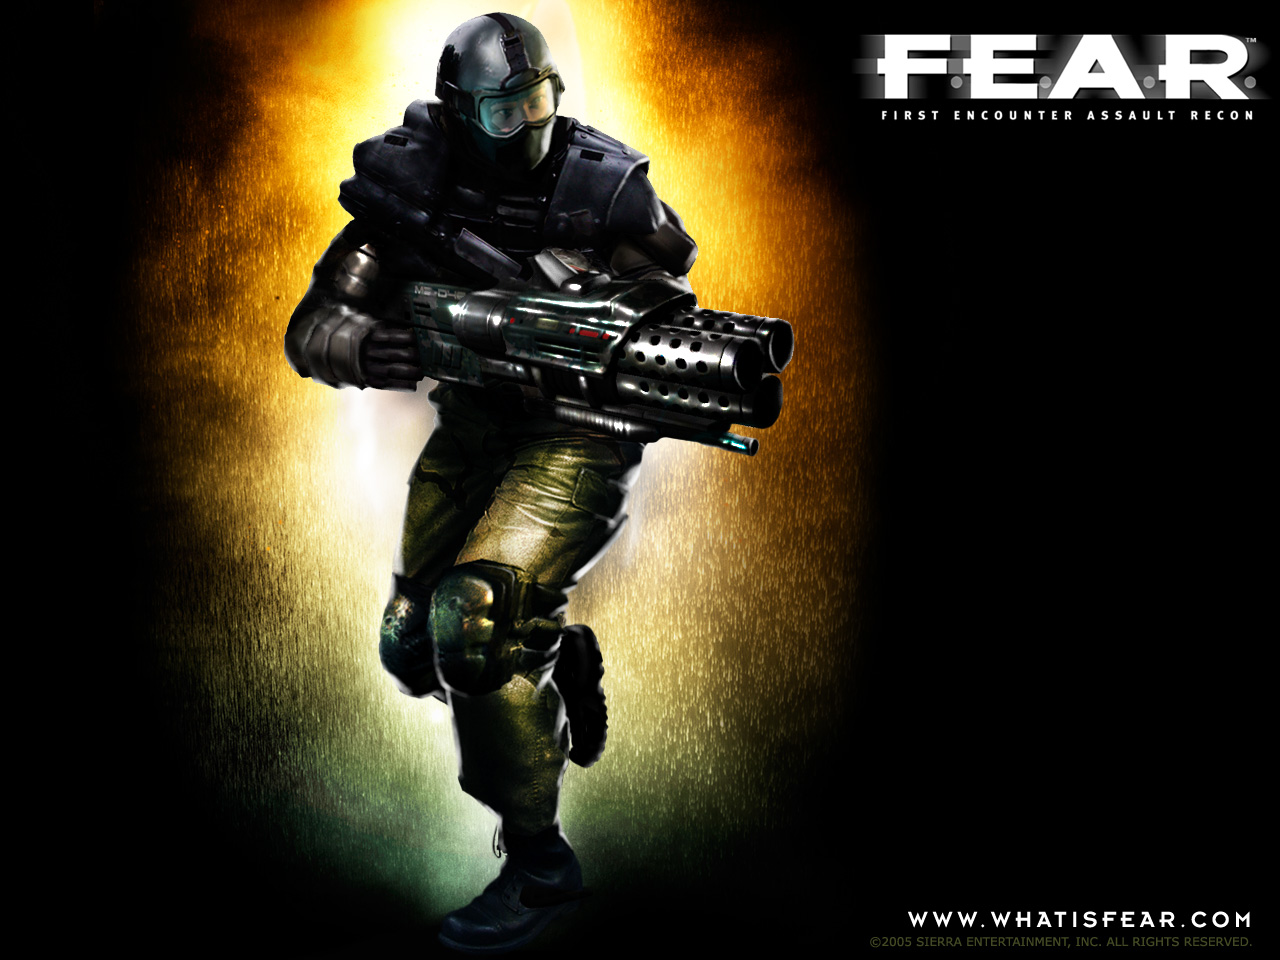 encounter assault recon5D wallpaper no fear wallpaper no fearjpg 1280x960